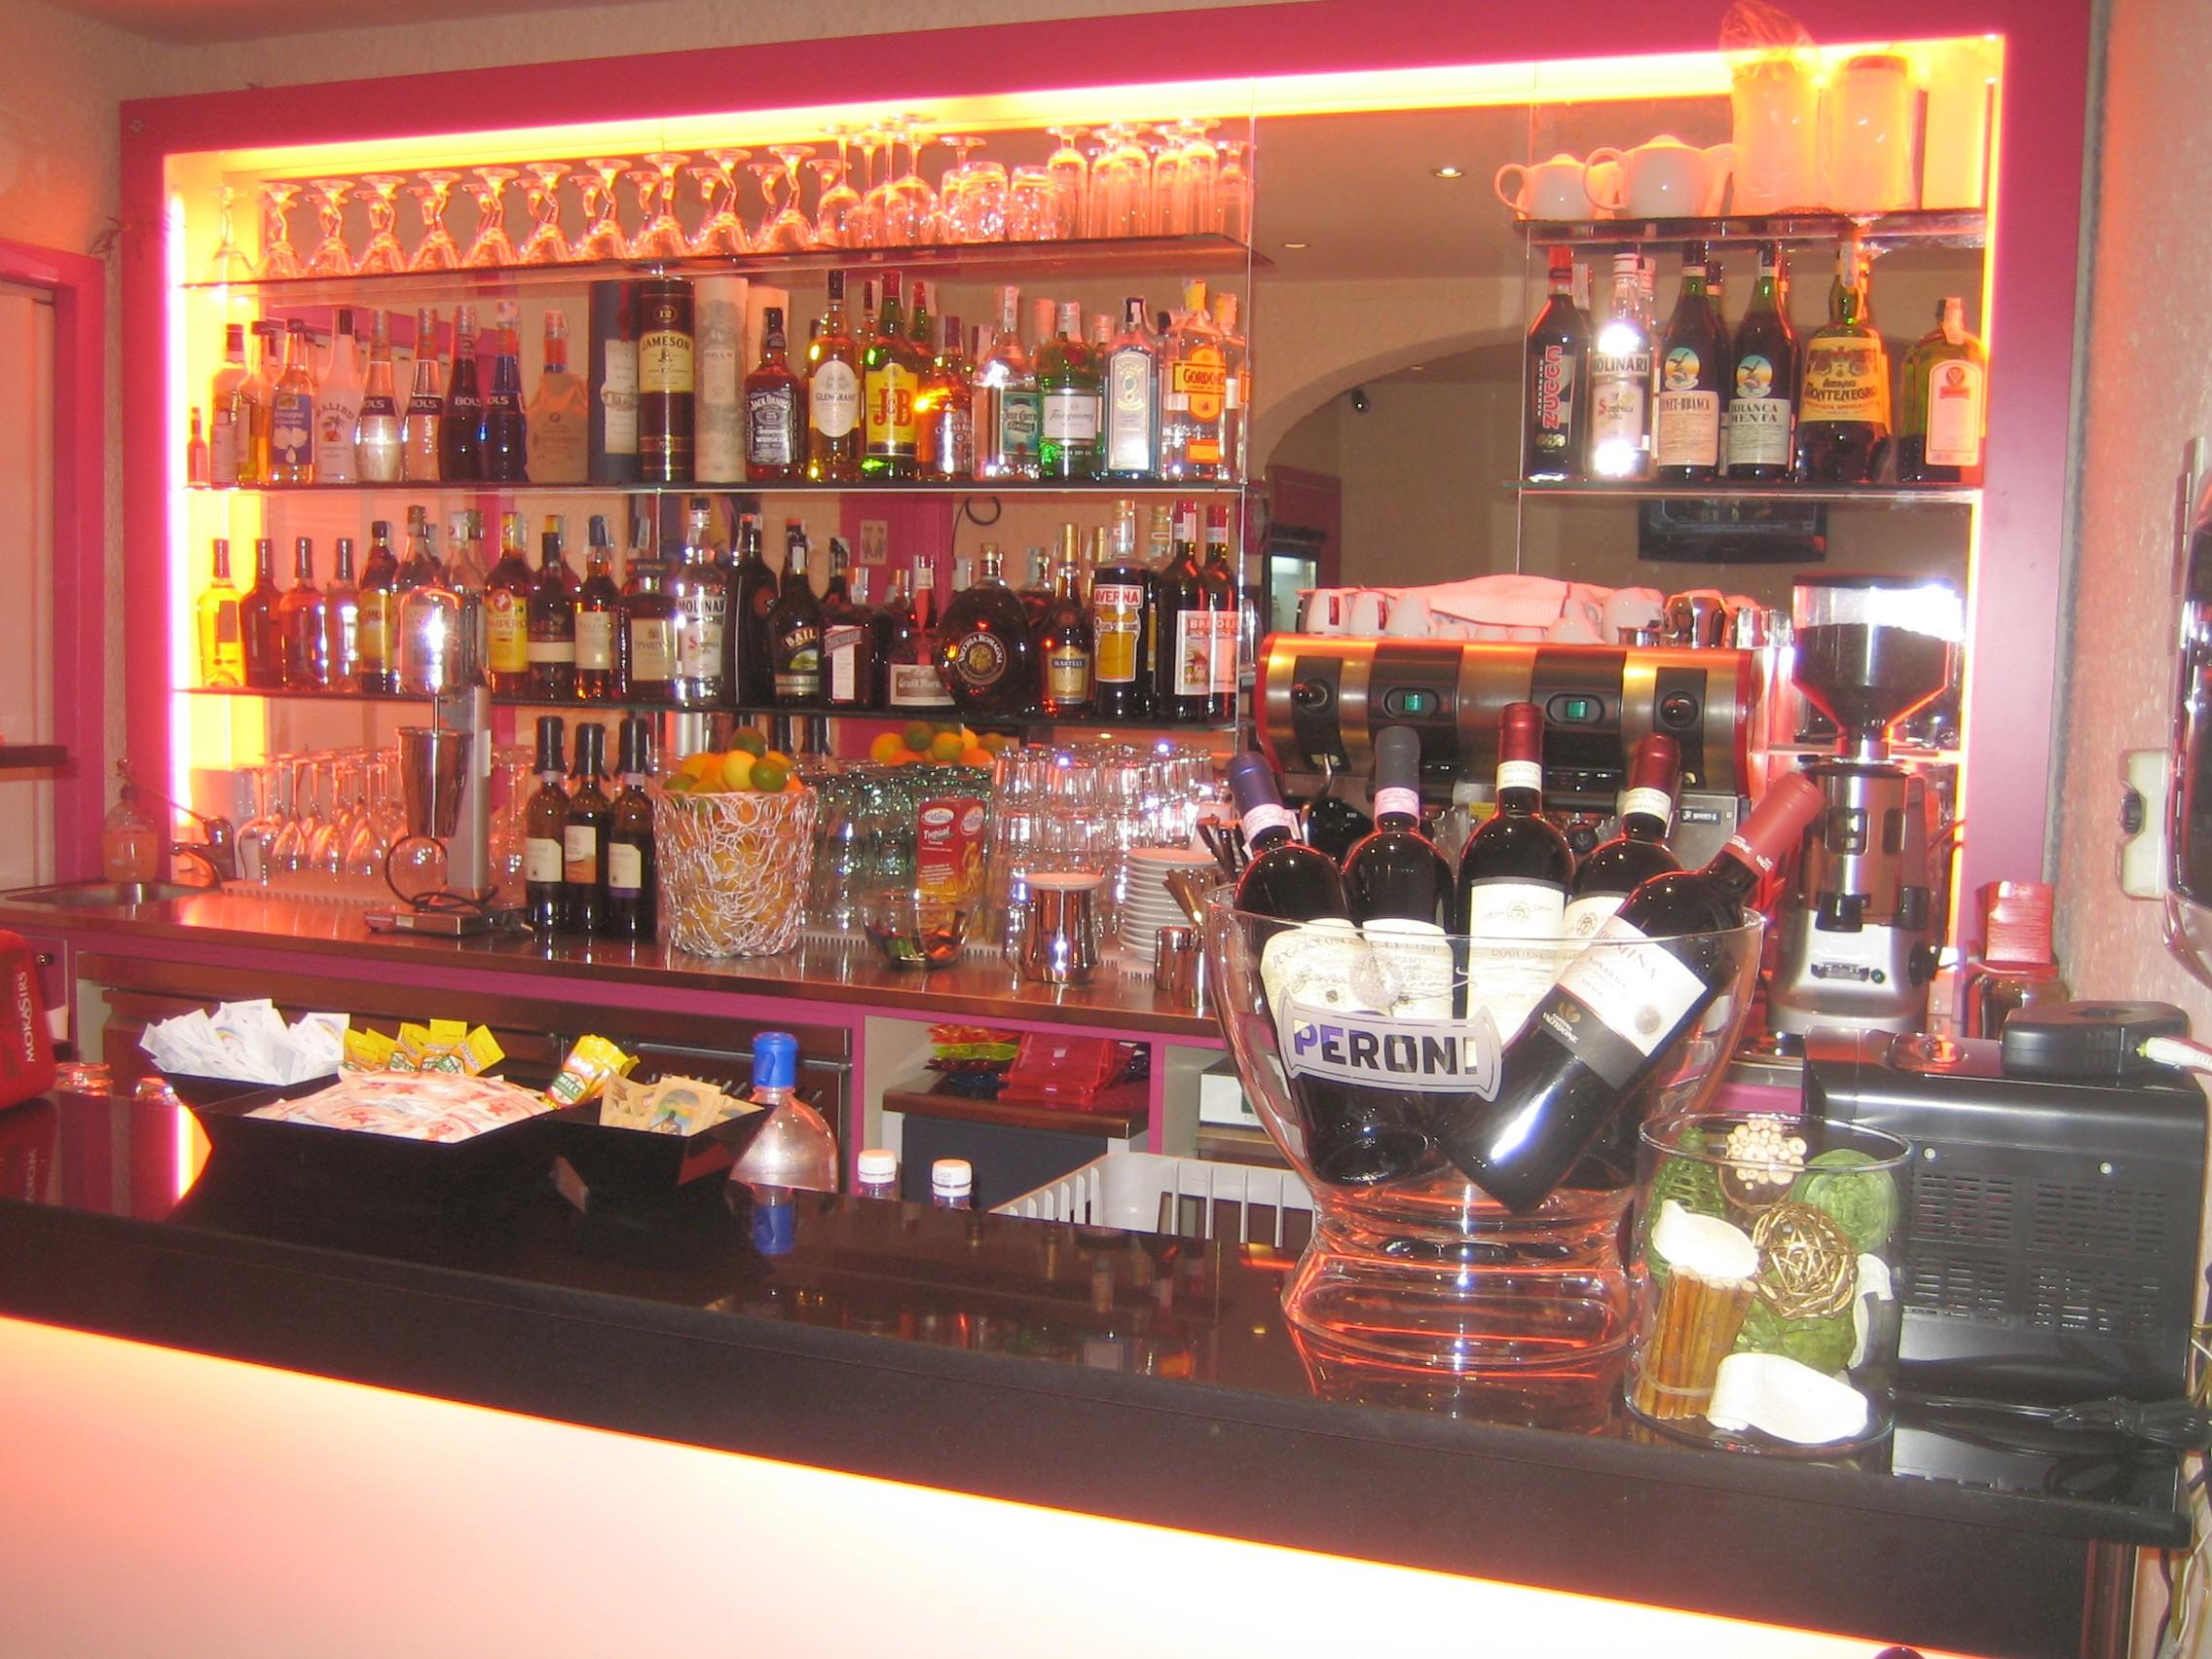 banco bar liguria, banchi bar liguria, banconi bar liguria = OSSERVATE ...